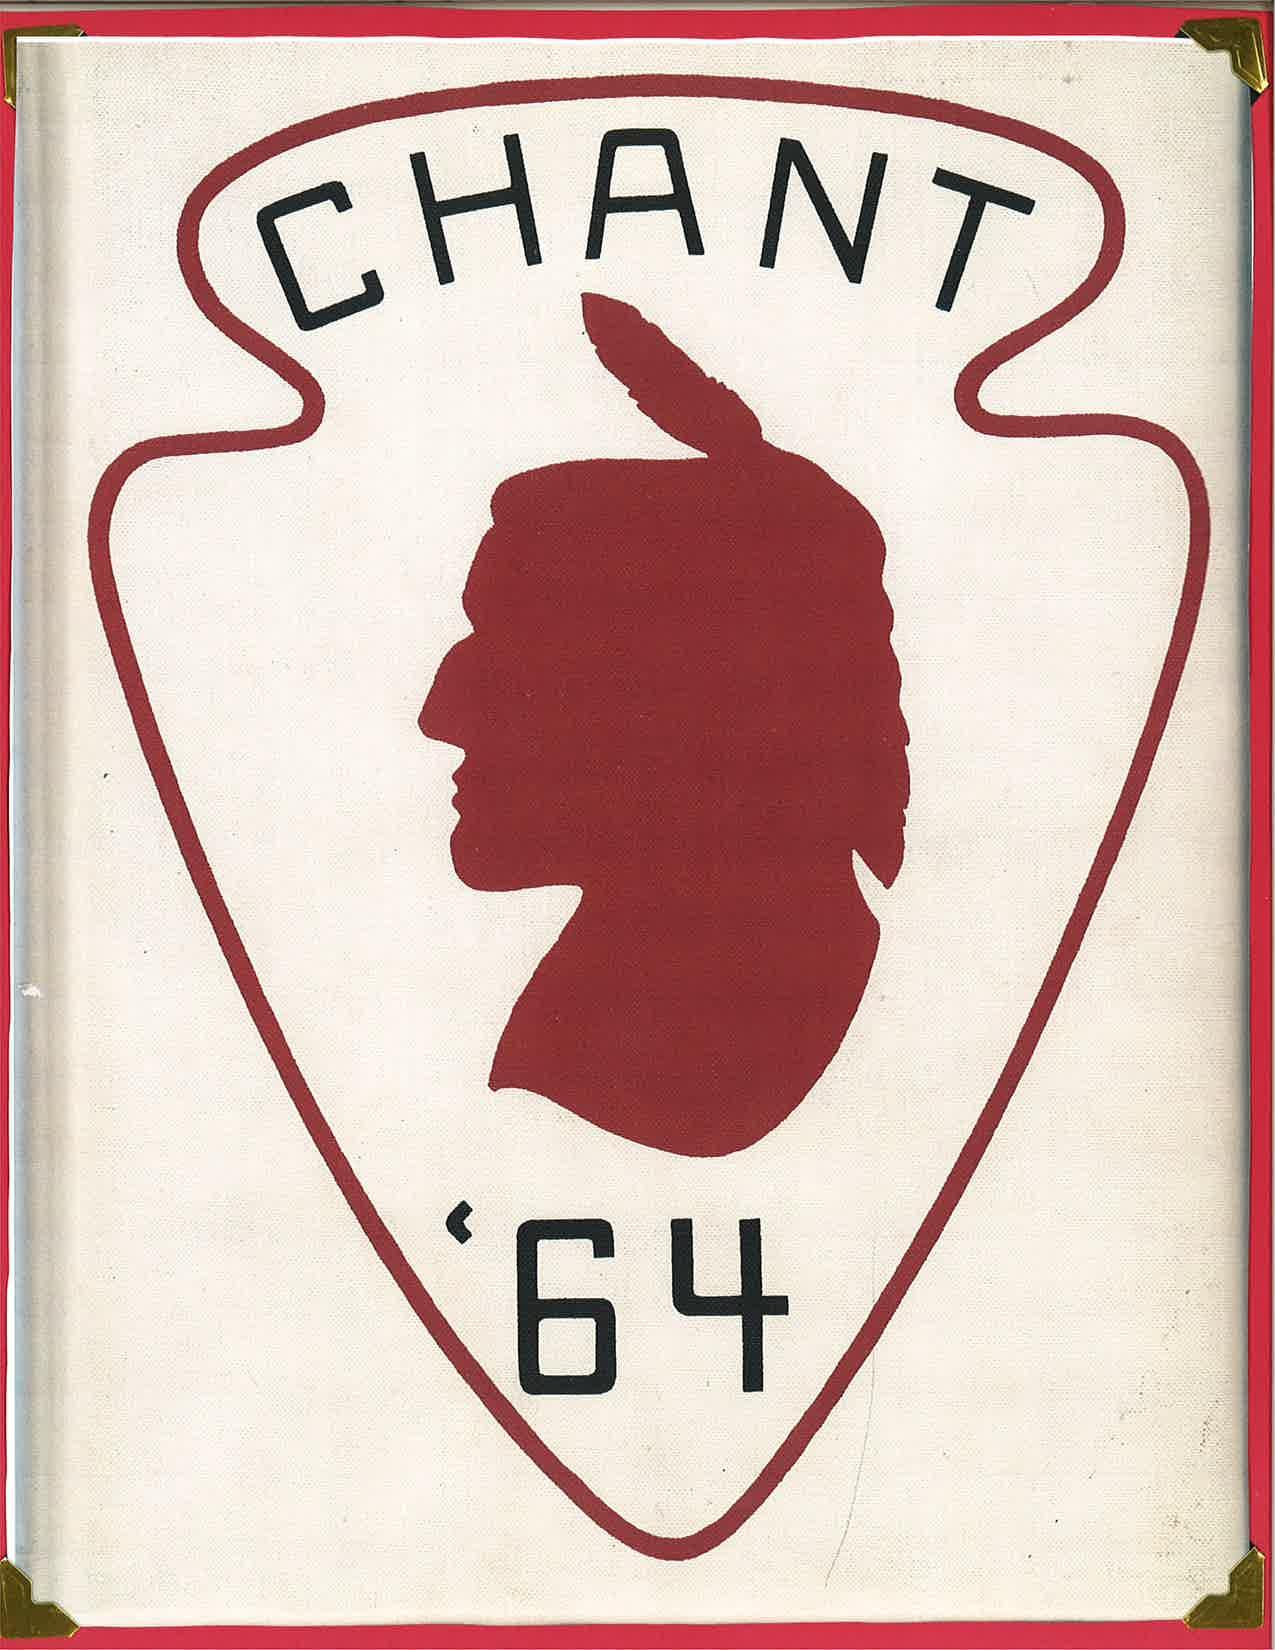 1964_Chant_Cover.jpg